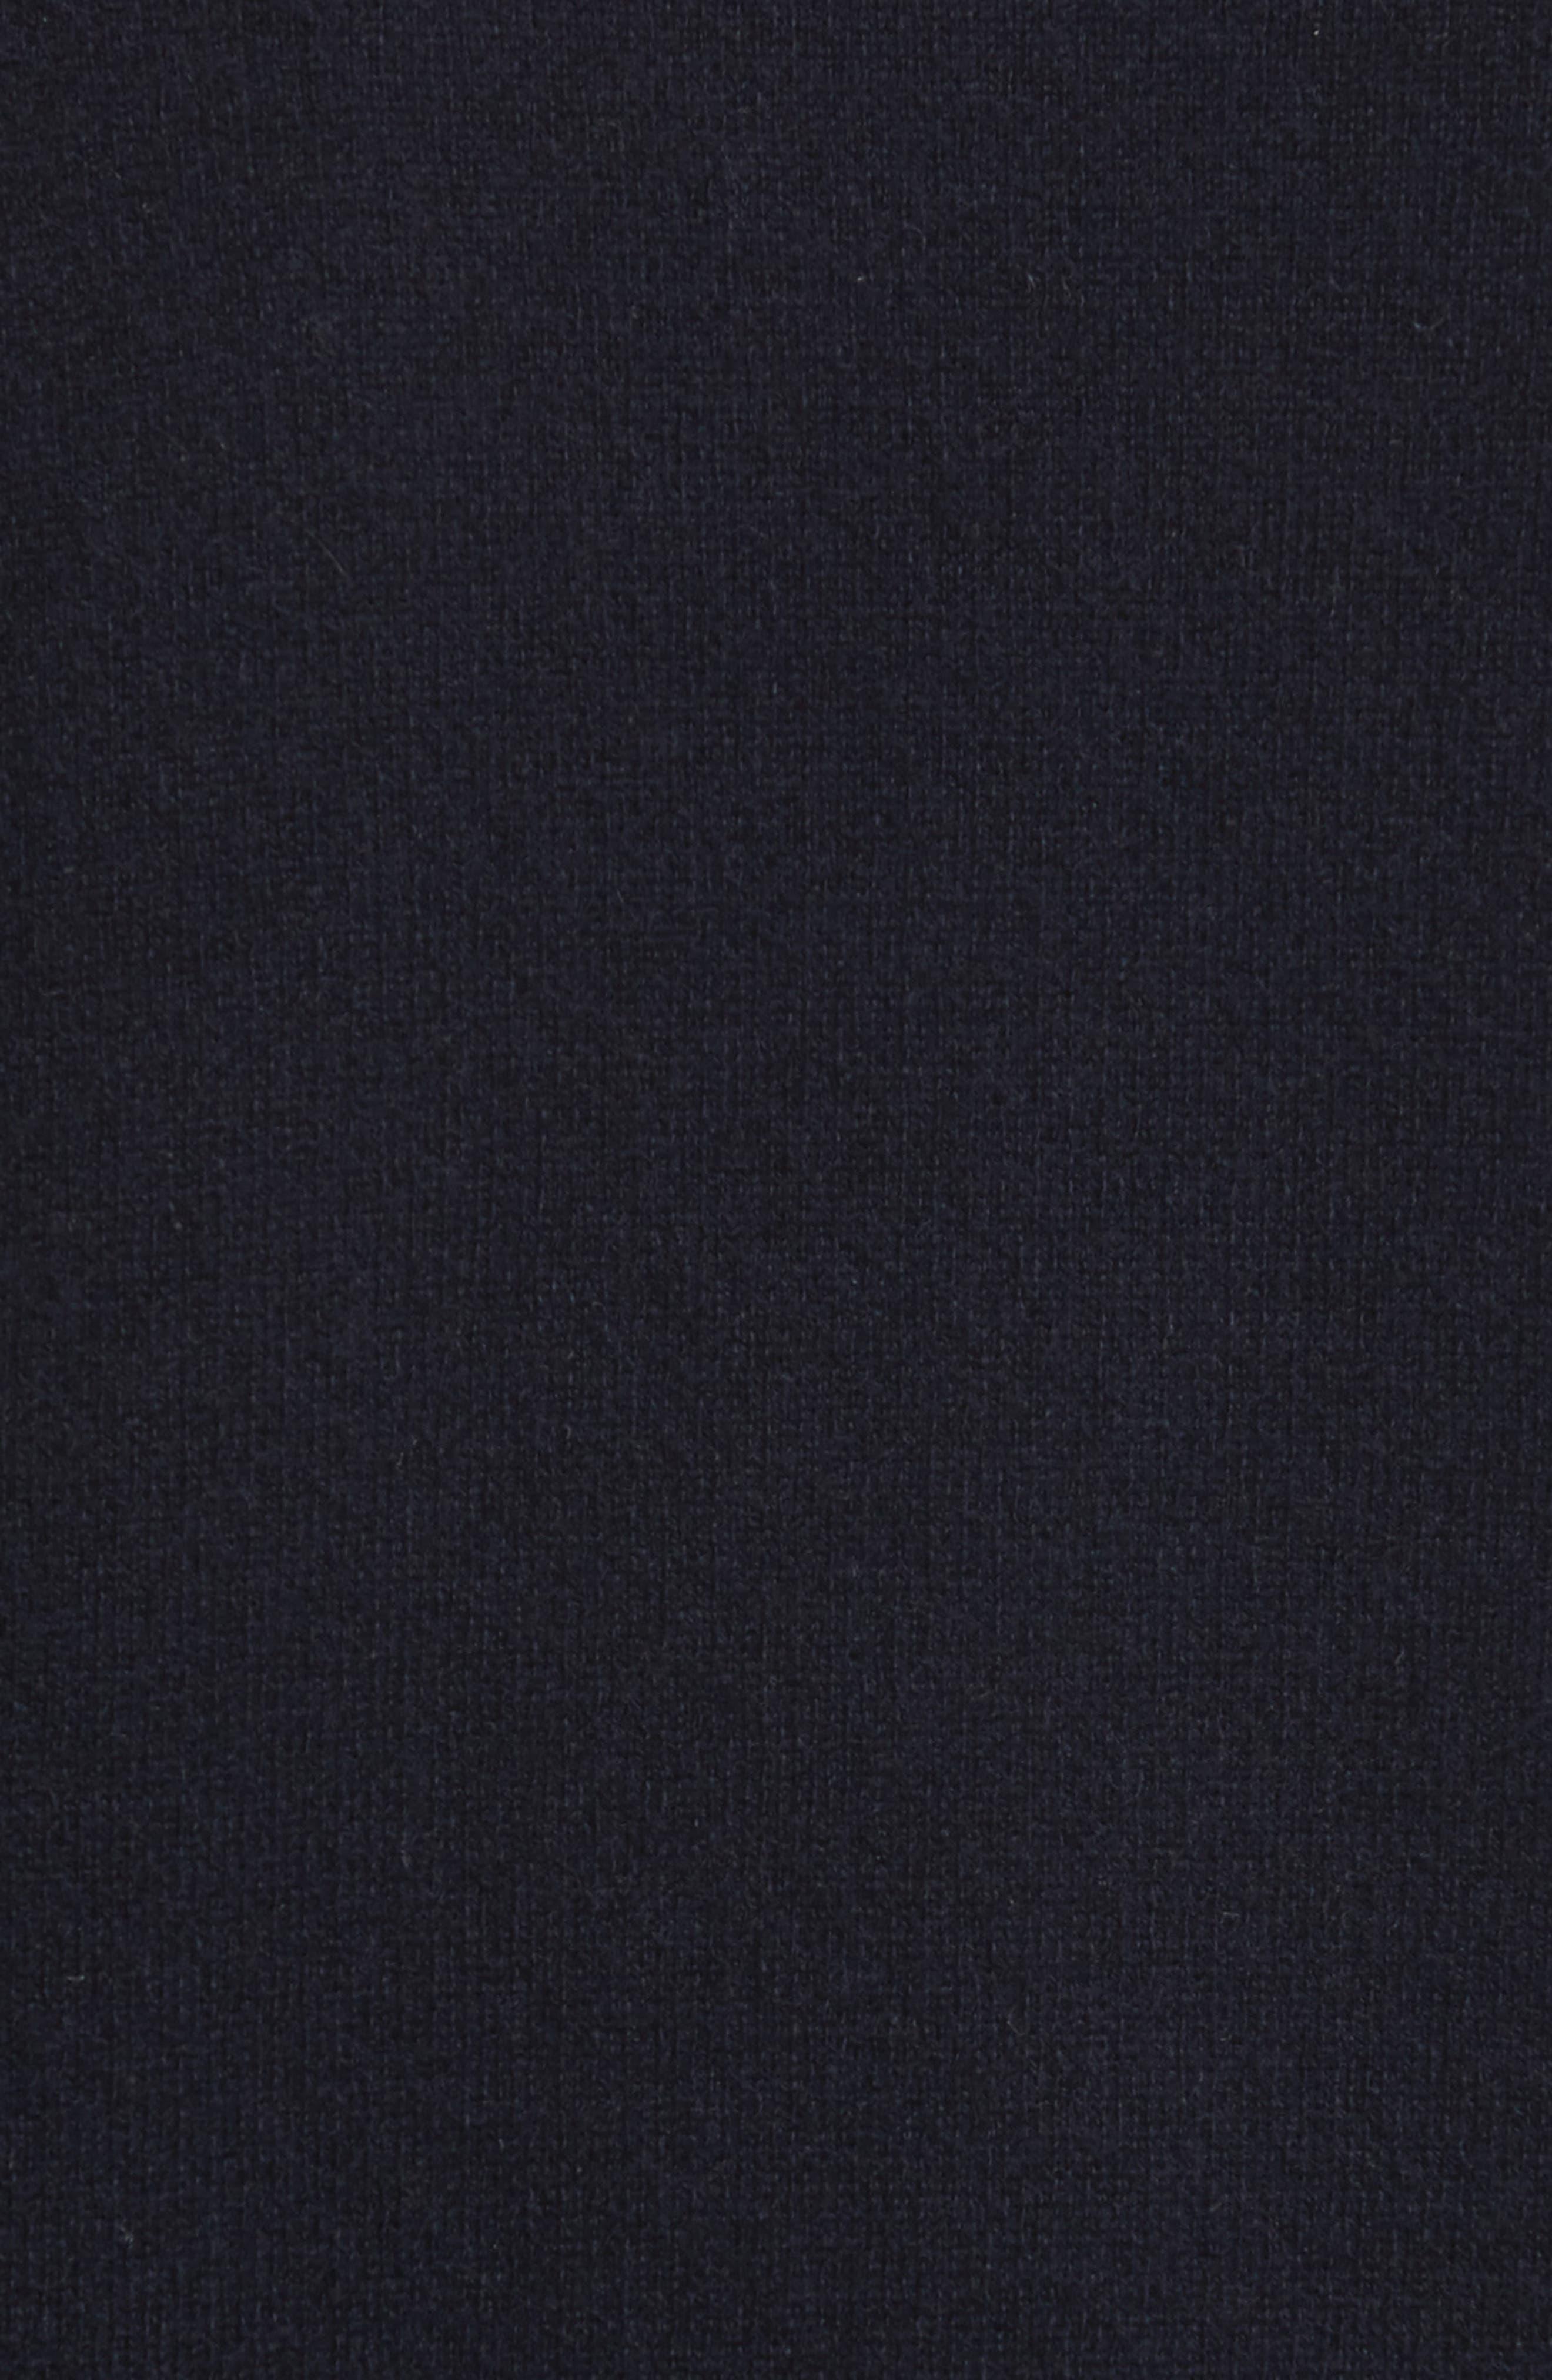 Double Layer Cashmere & Cotton Sweater,                             Alternate thumbnail 10, color,